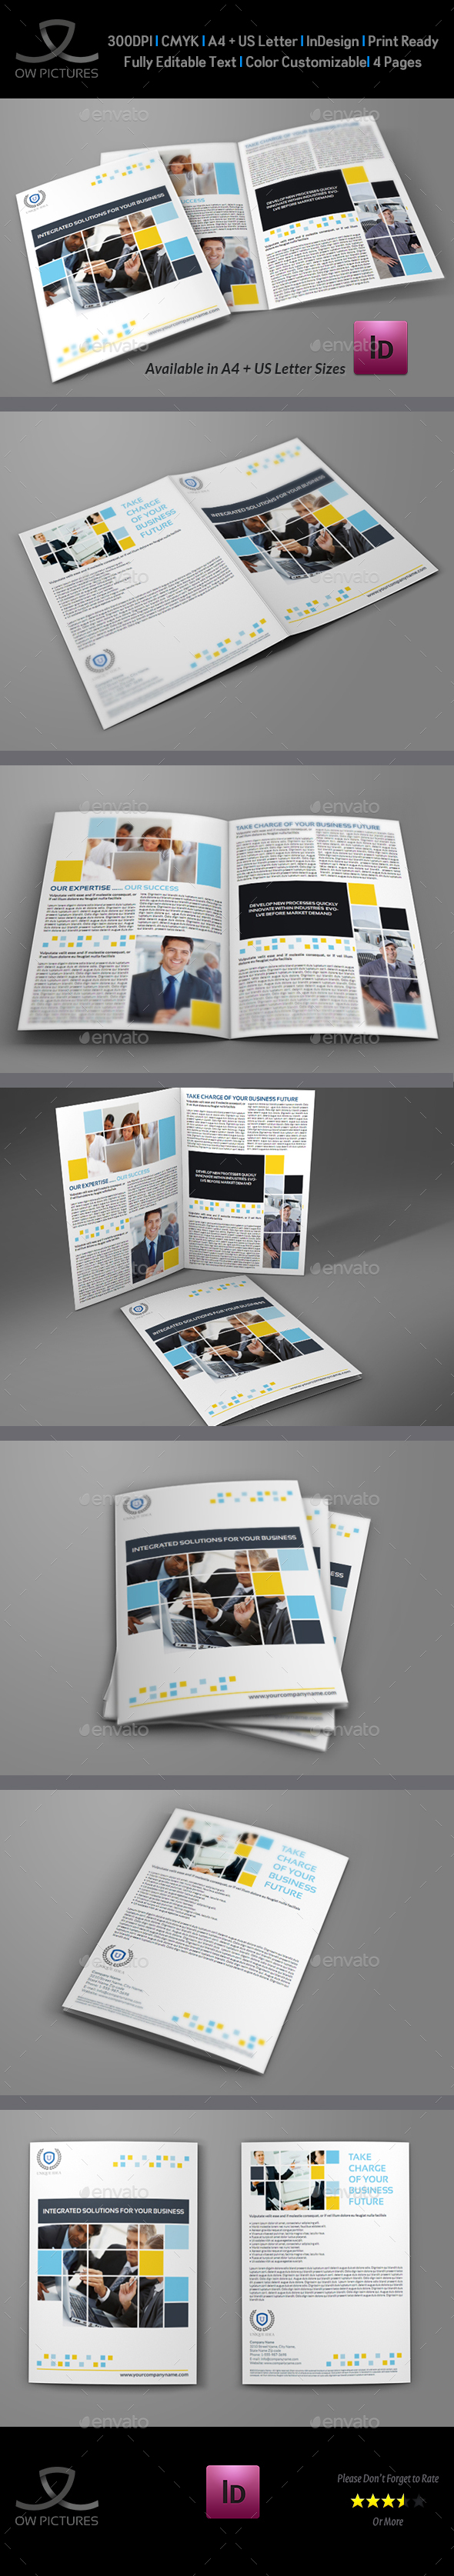 Company Brochure Bi-Fold Template Vol.6 - Corporate Brochures